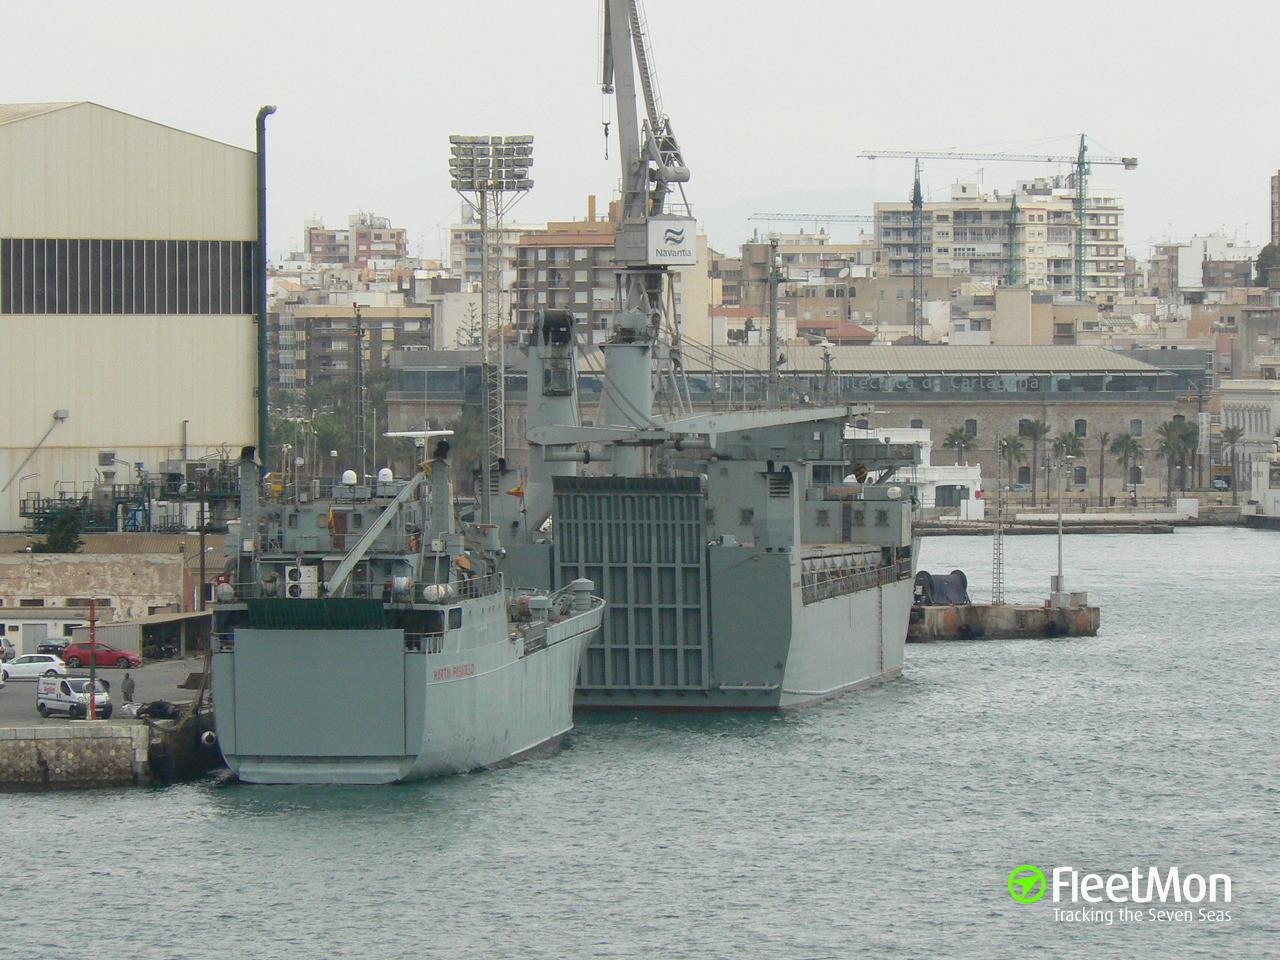 Buque M C EN (Transport ship) IMO —, MMSI 224066000